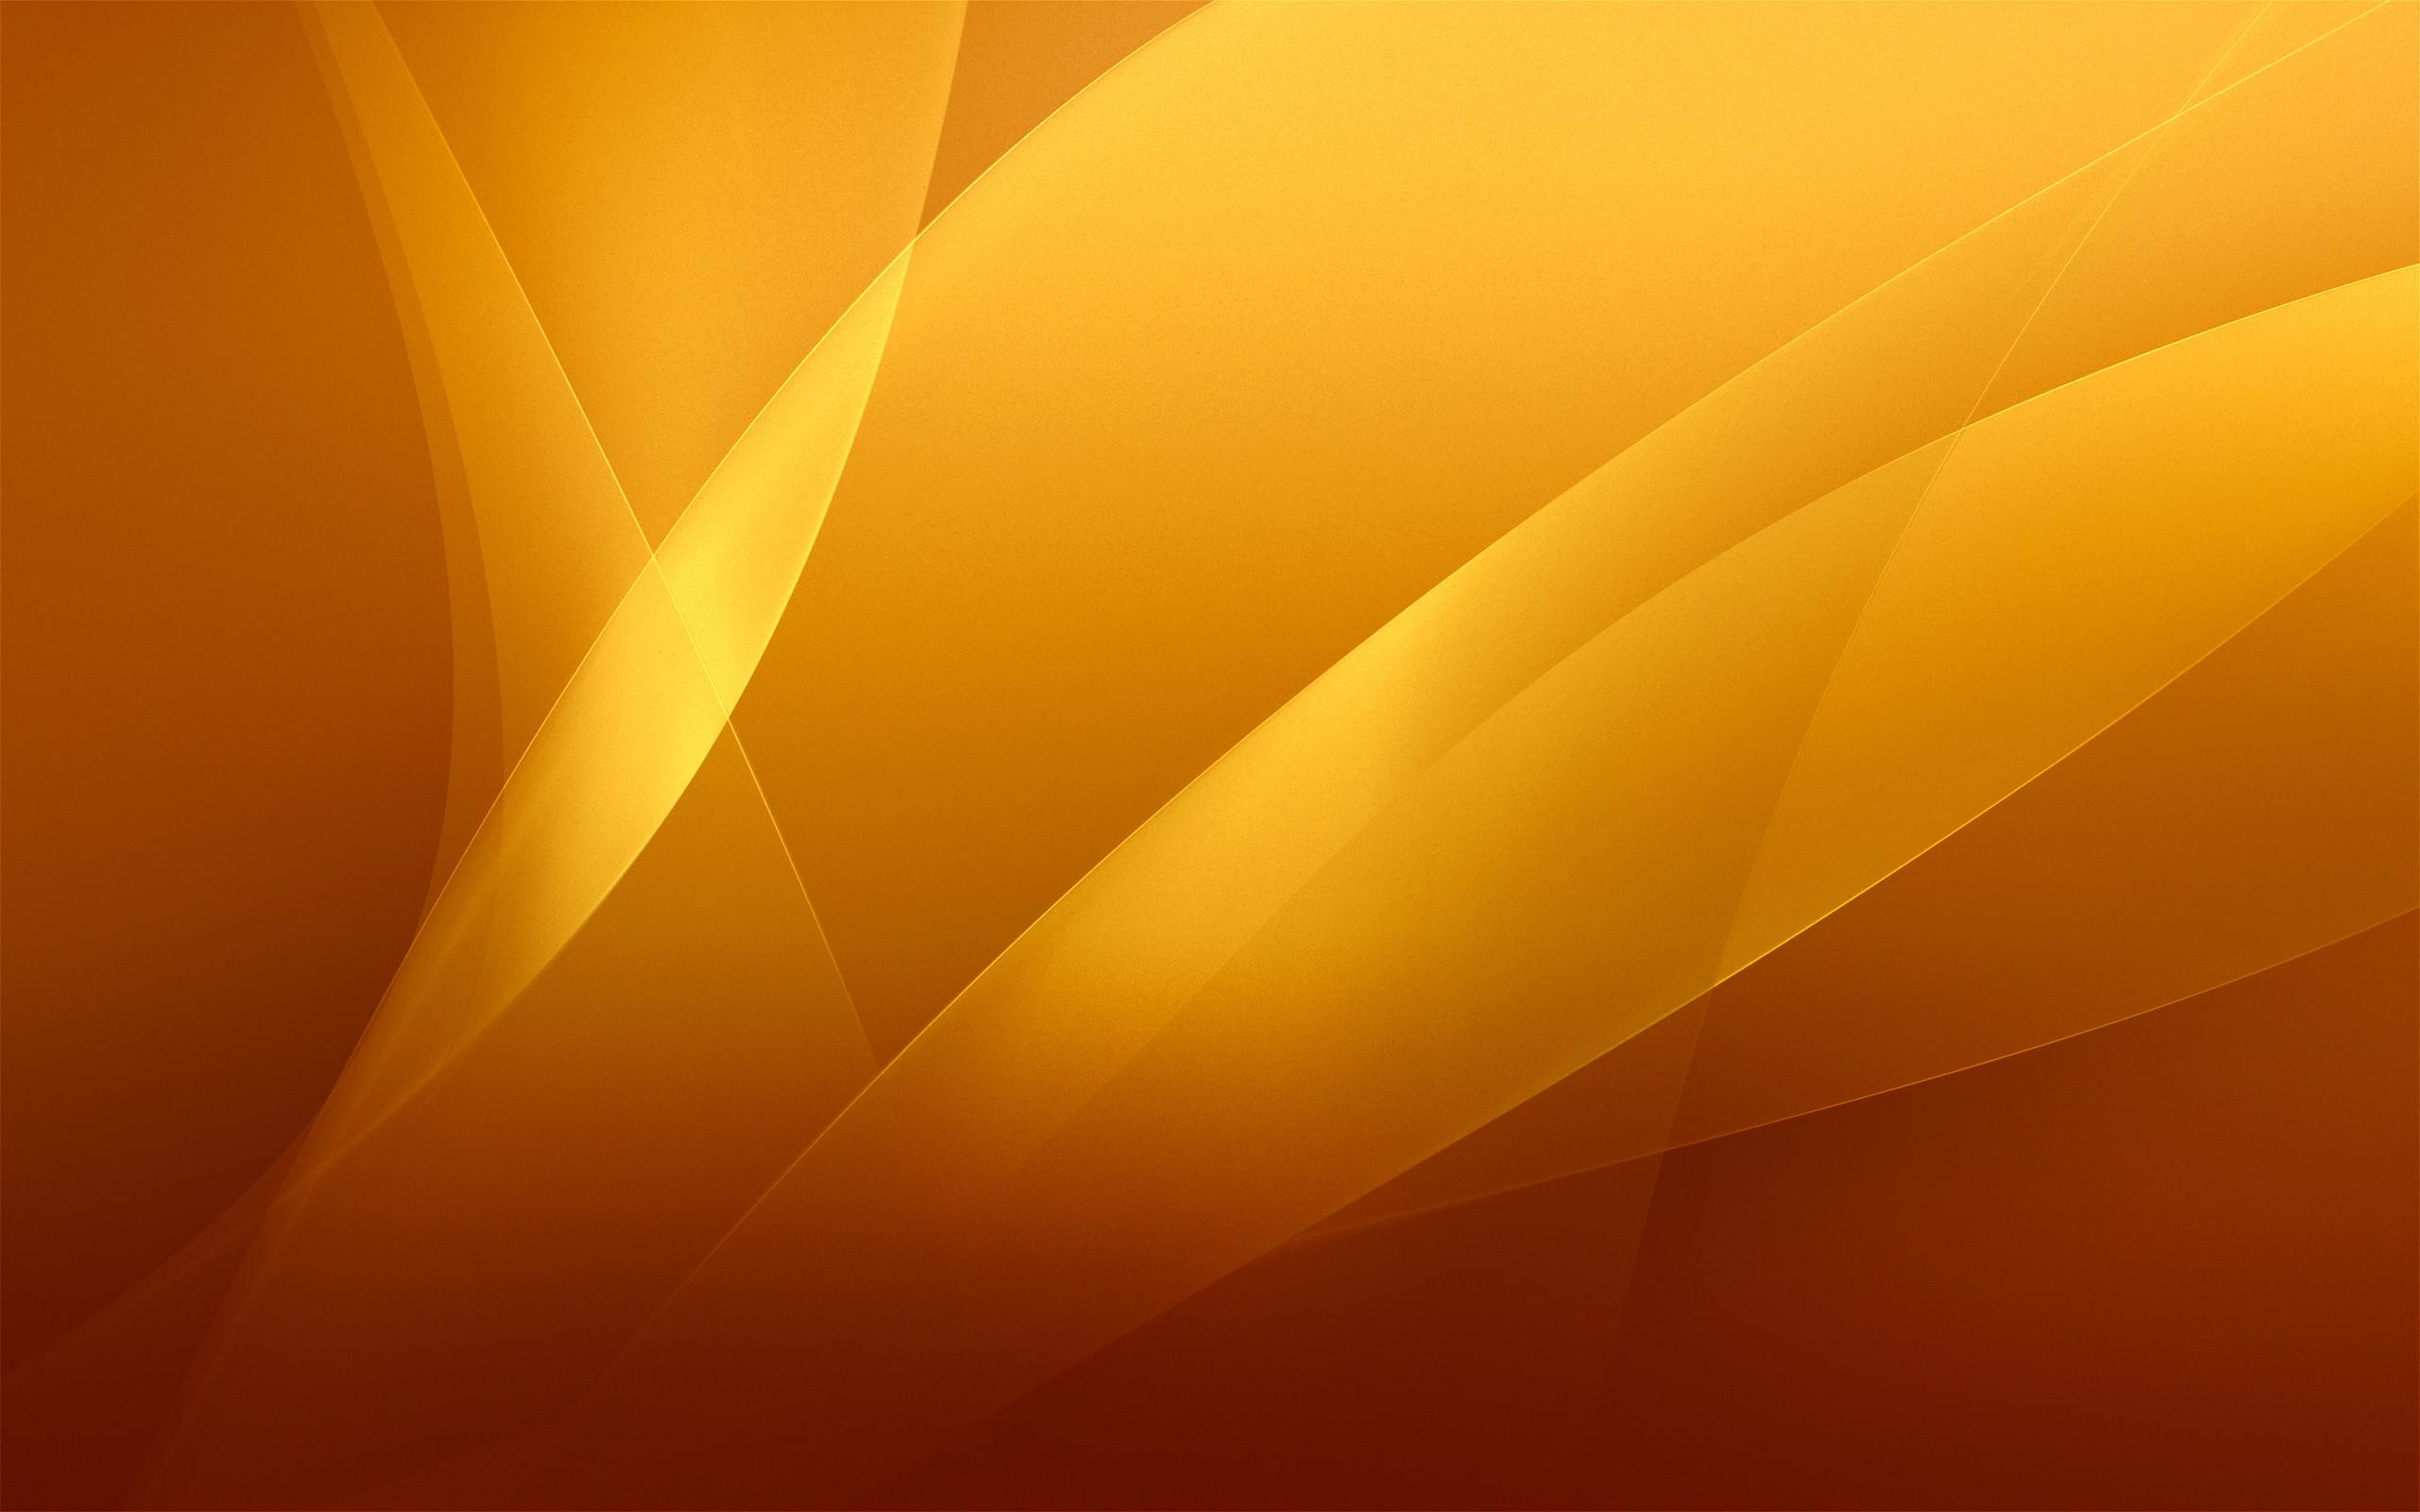 Abstract Orange Wallpaper 997